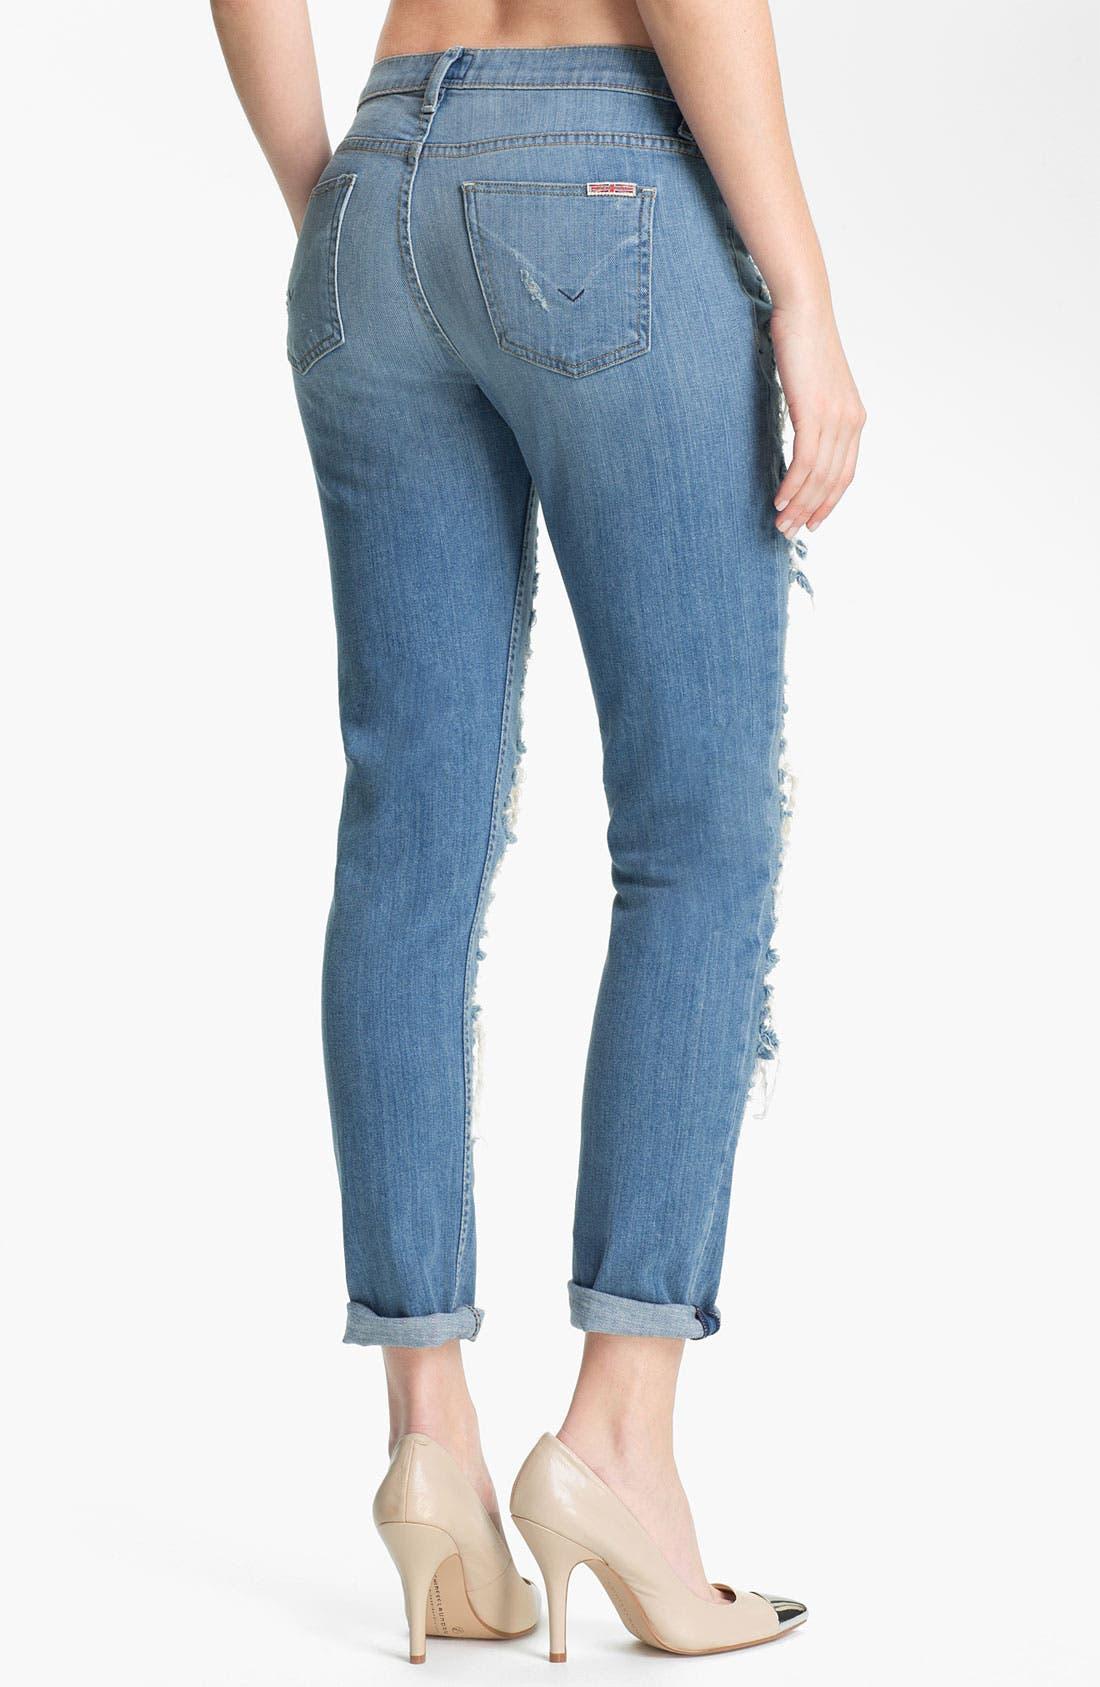 Alternate Image 2  - Hudson Jeans 'Courtney' Slashed Straight Leg Jeans (Anti-Establishment)